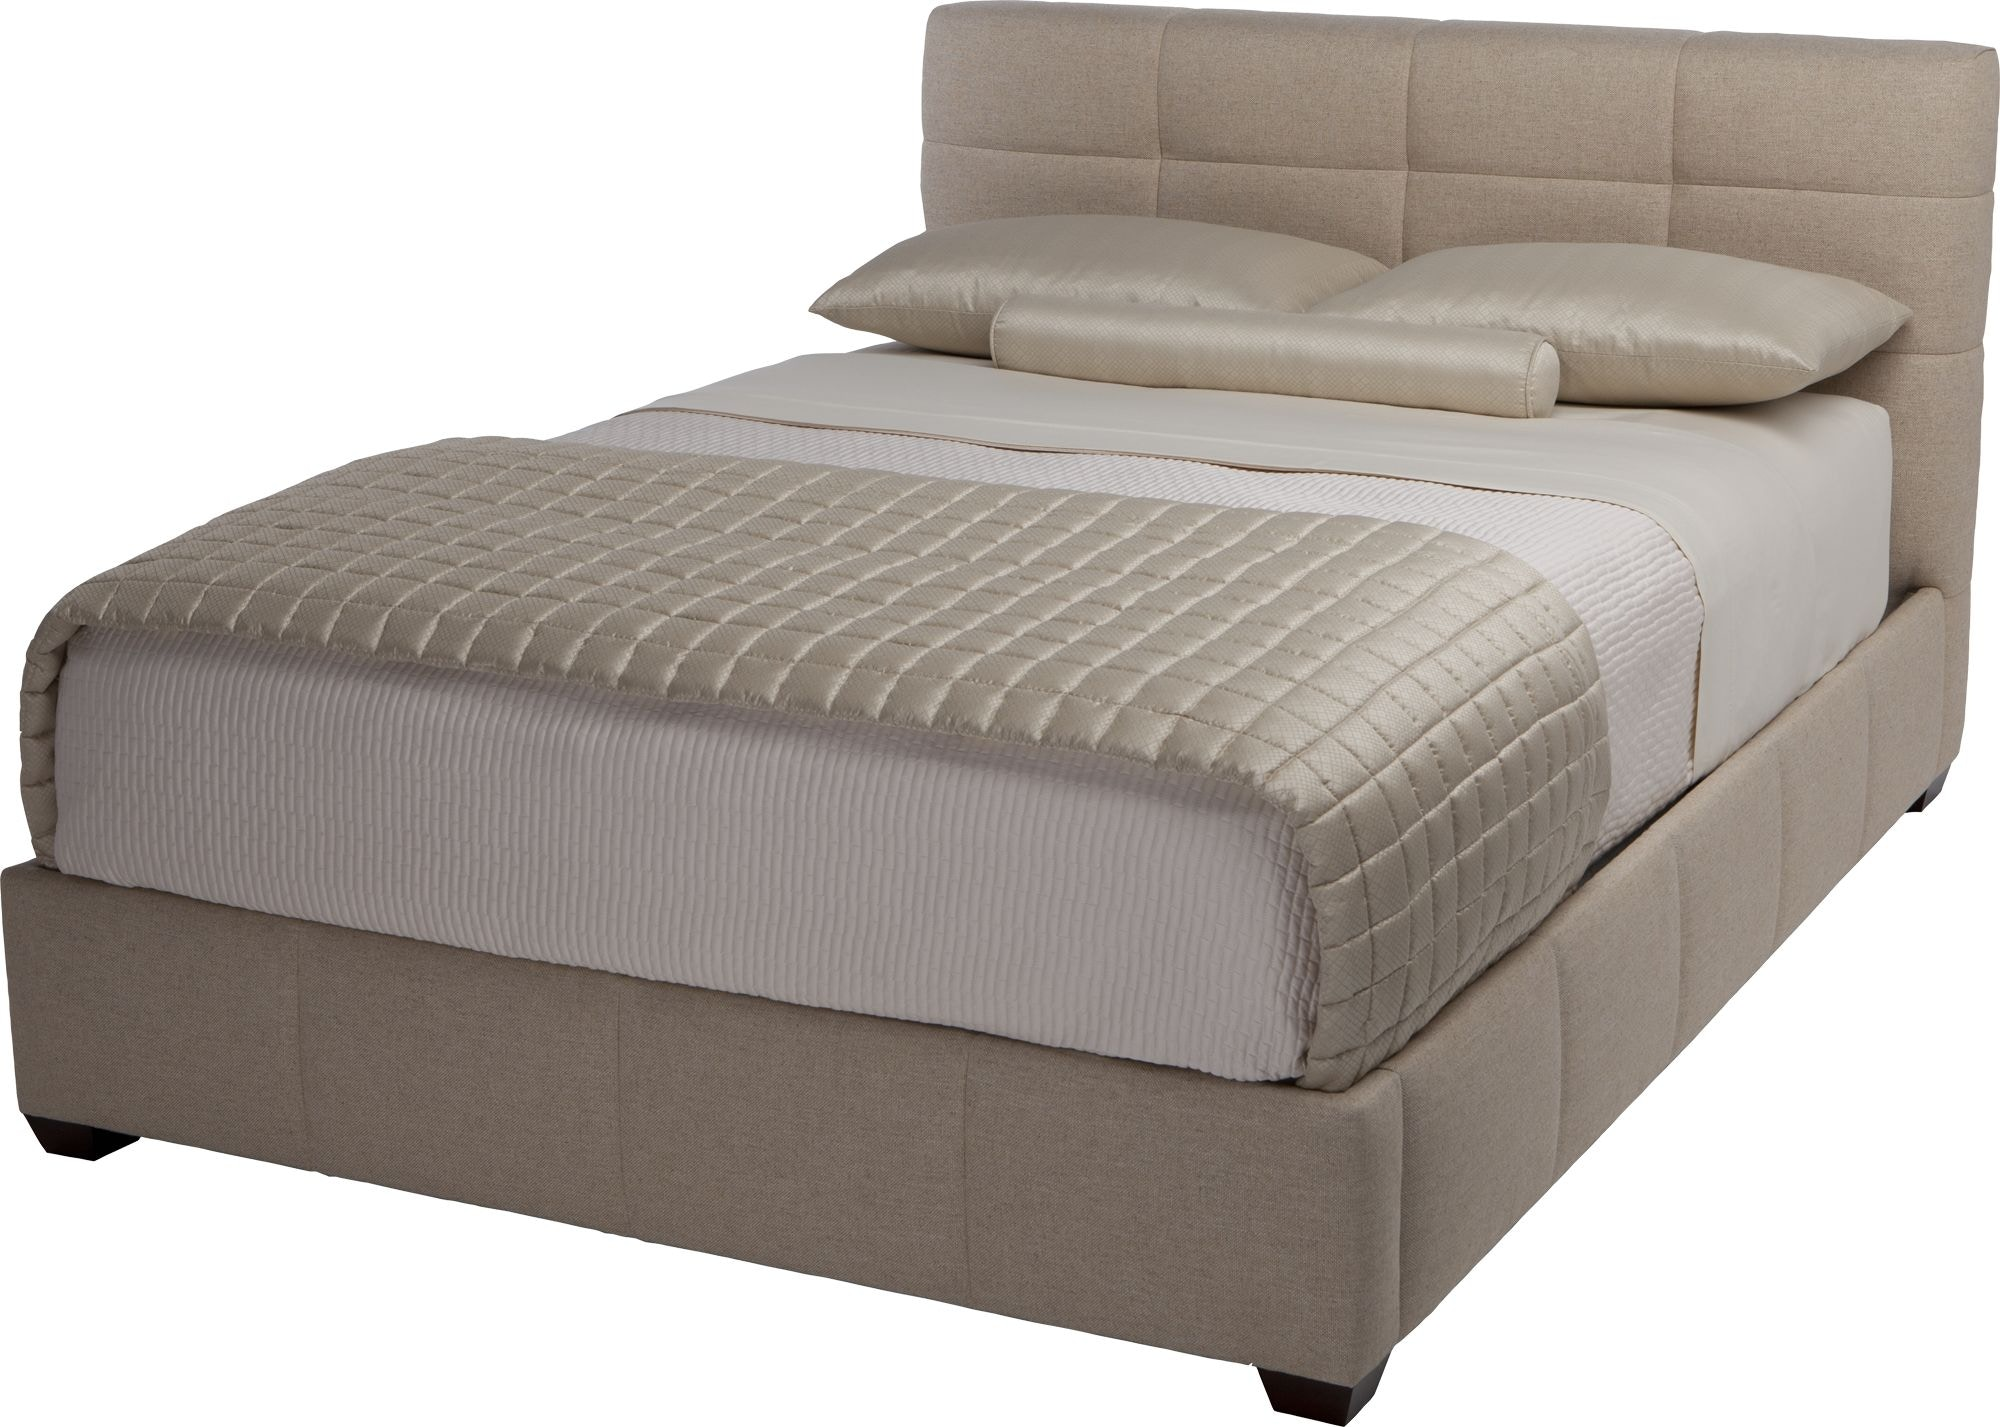 Baker Furniture 7827 06 Bedroom Thomas Pheasant Paris Bed King